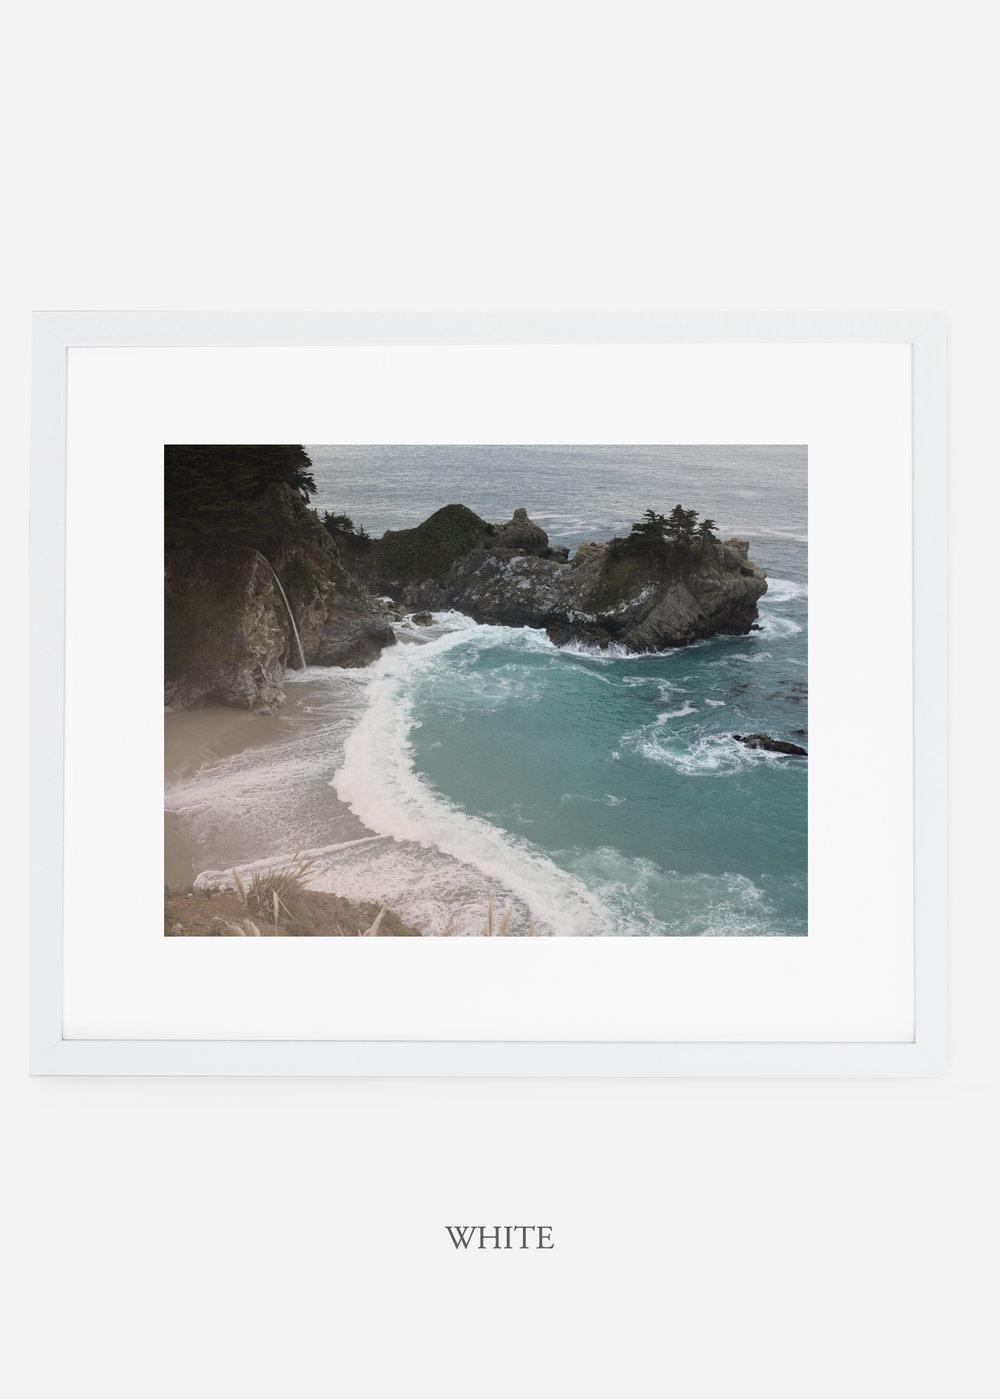 WilderCalifornia_whiteframe_interiordesign_oceanprint_BigSurNo.1.jpg